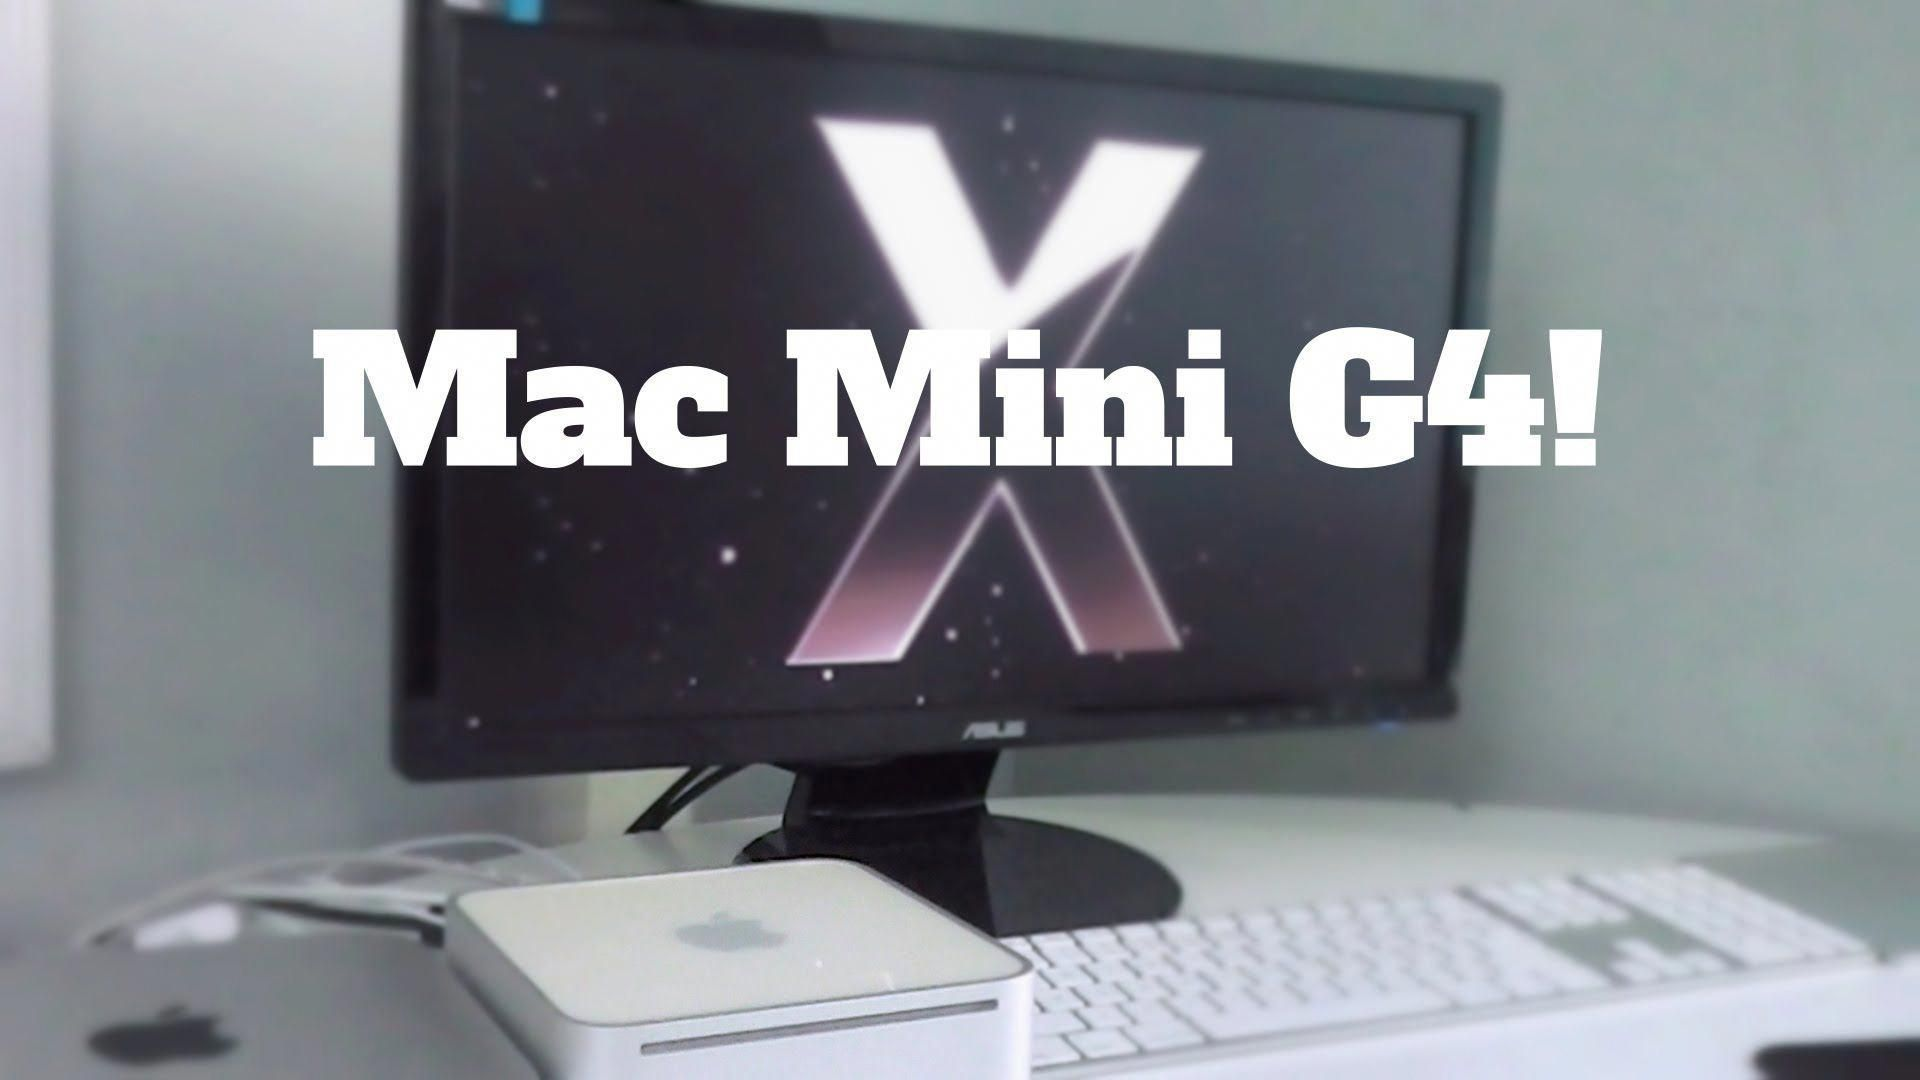 Mac Mini G4 Retro Unboxing 50 Mac Macmini Macminiworkstation Mac Mini Mac Mini